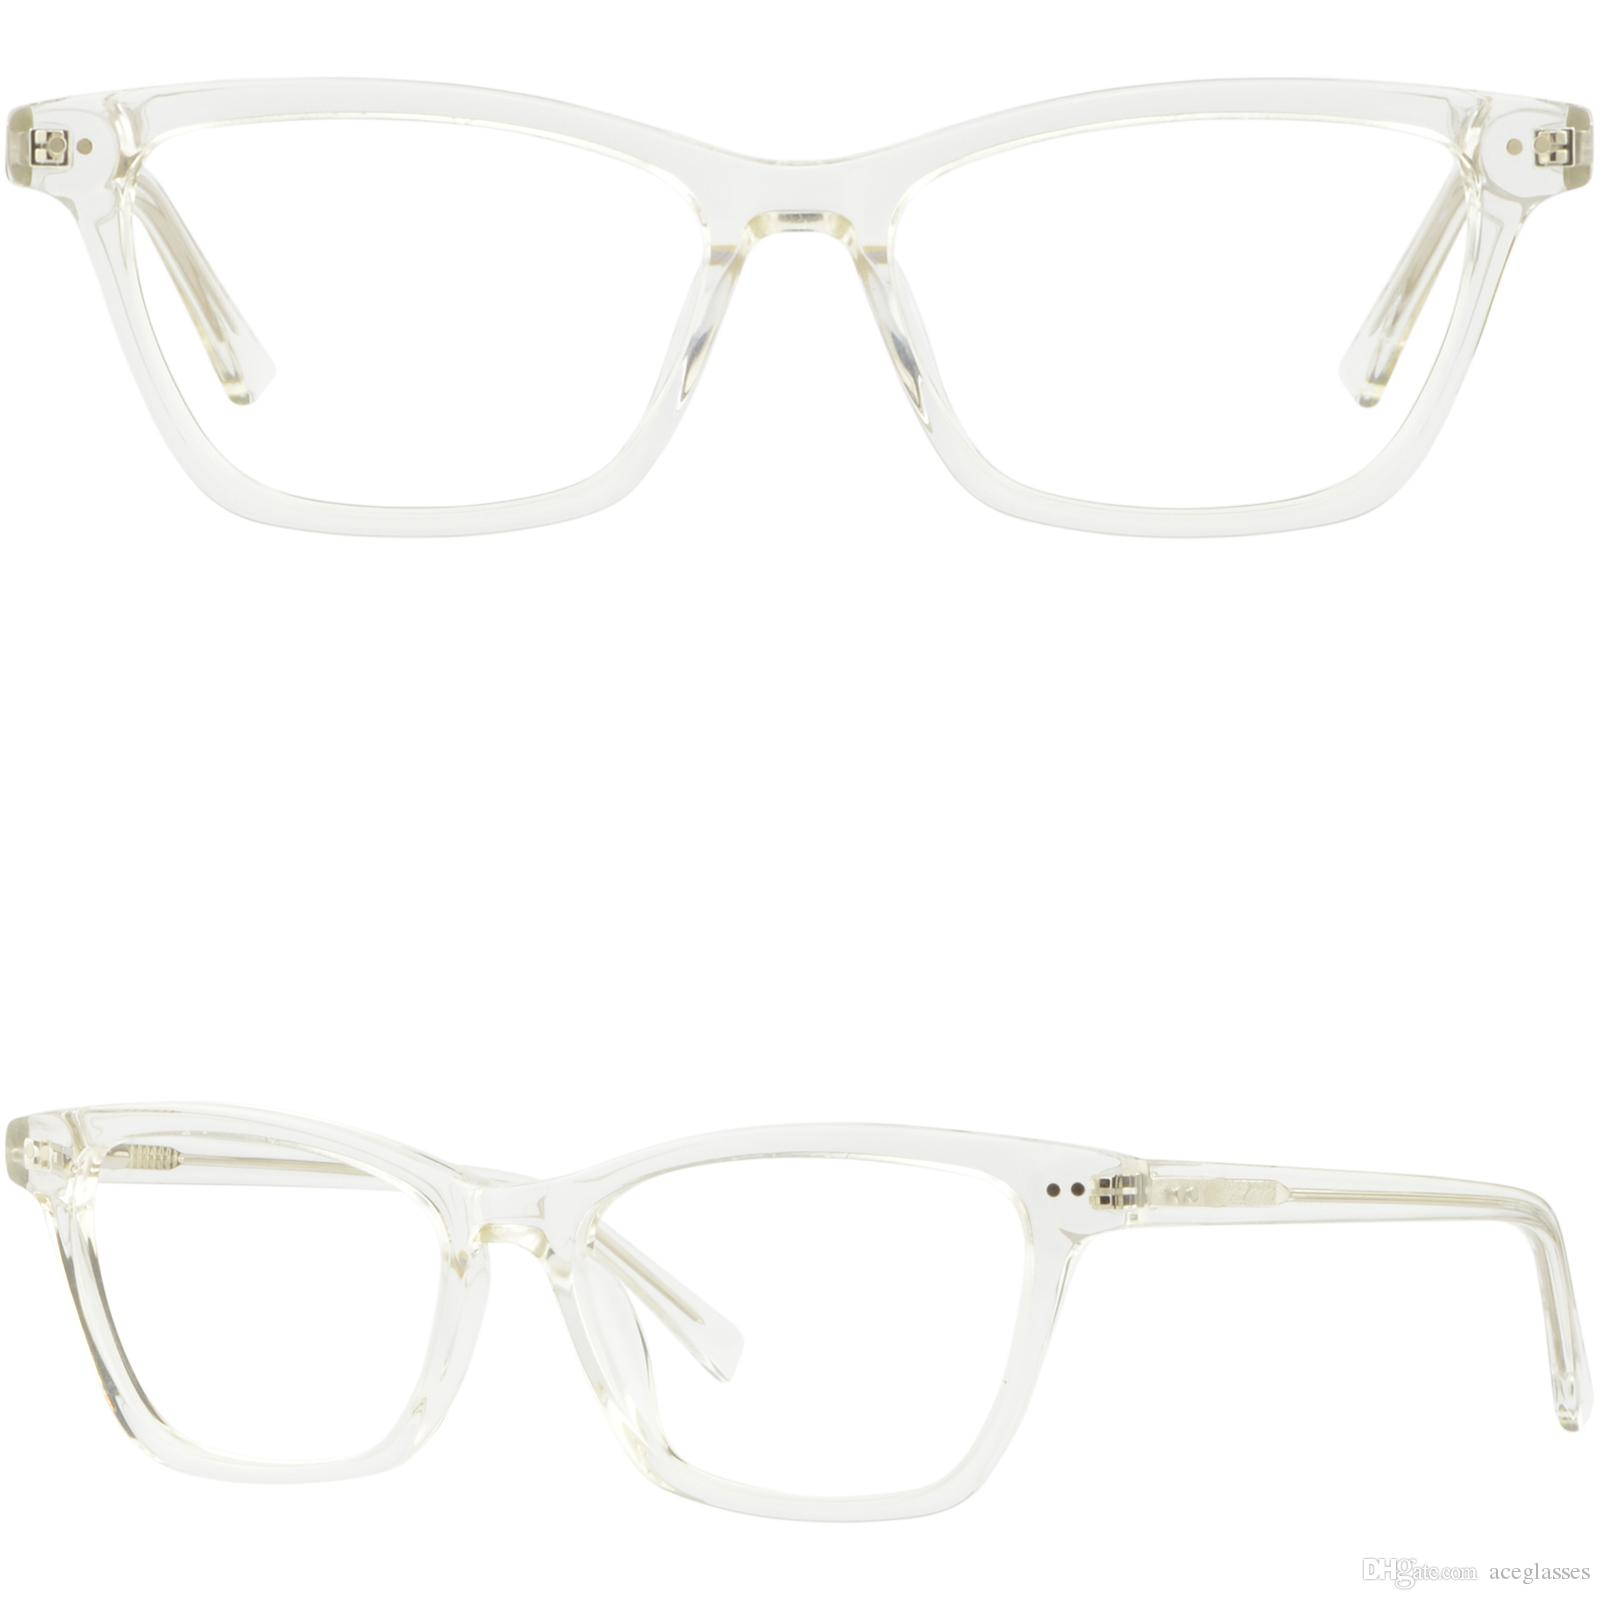 0f261c34d1e Large Womens Plastic Frames Spring Hinges Prescription Glasses Clear  Translucent Glasses Frame Online with  29.66 Piece on Aceglasses s Store